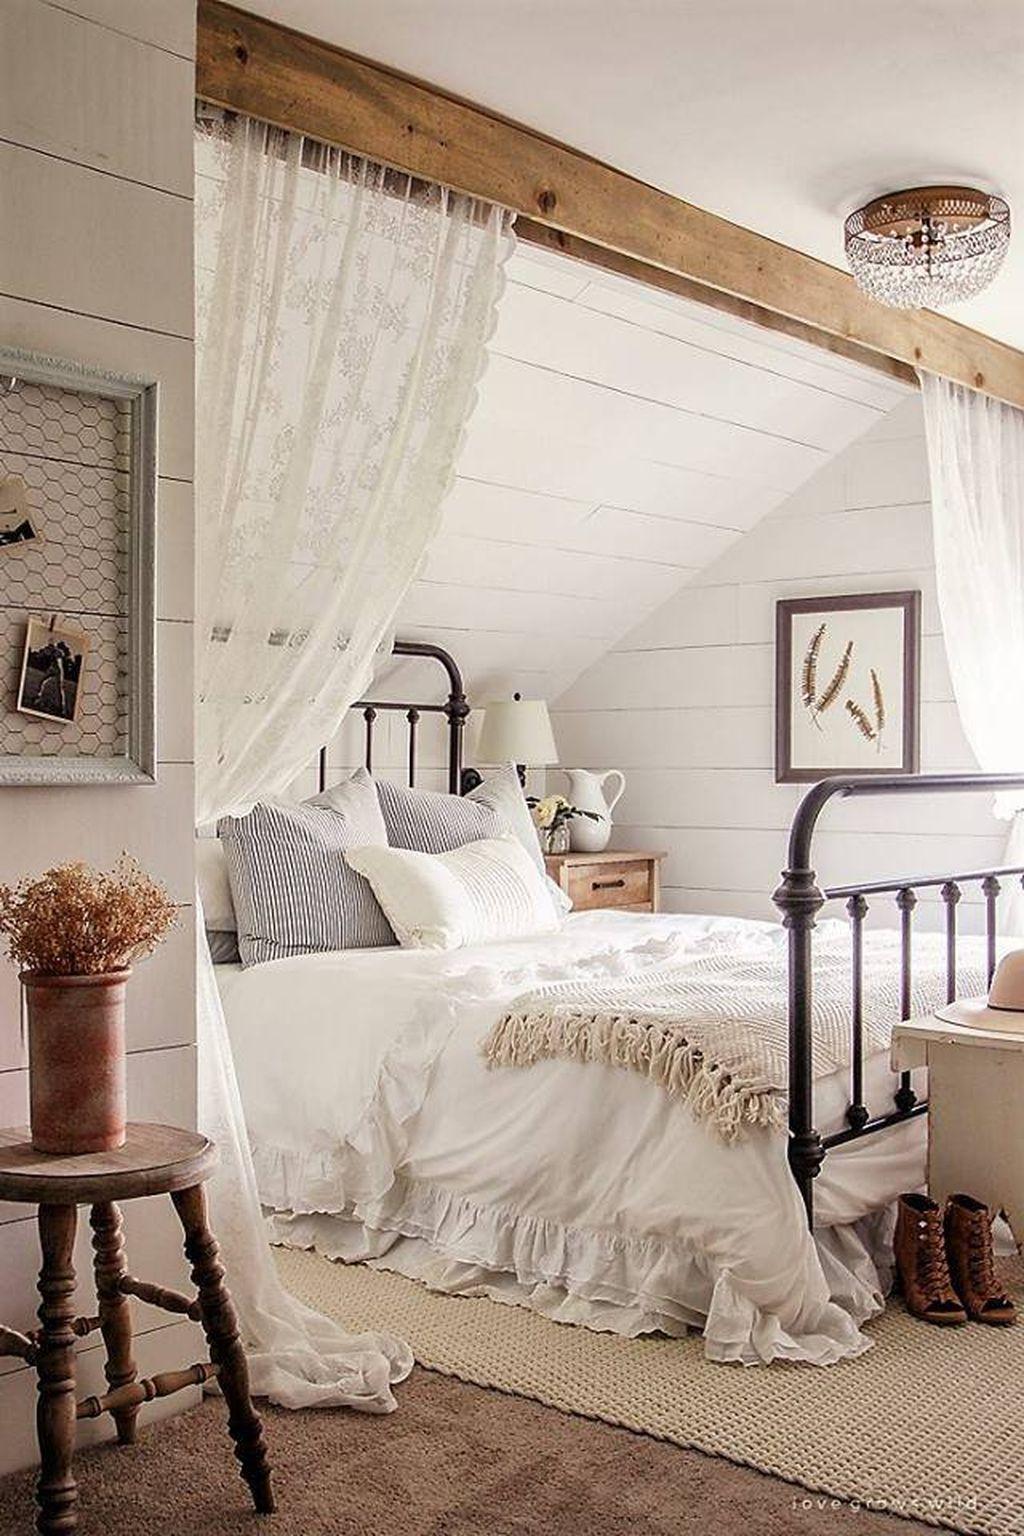 Master bedroom nook   Country Rustic Farmhouse Master Bedroom Decorating Ideas